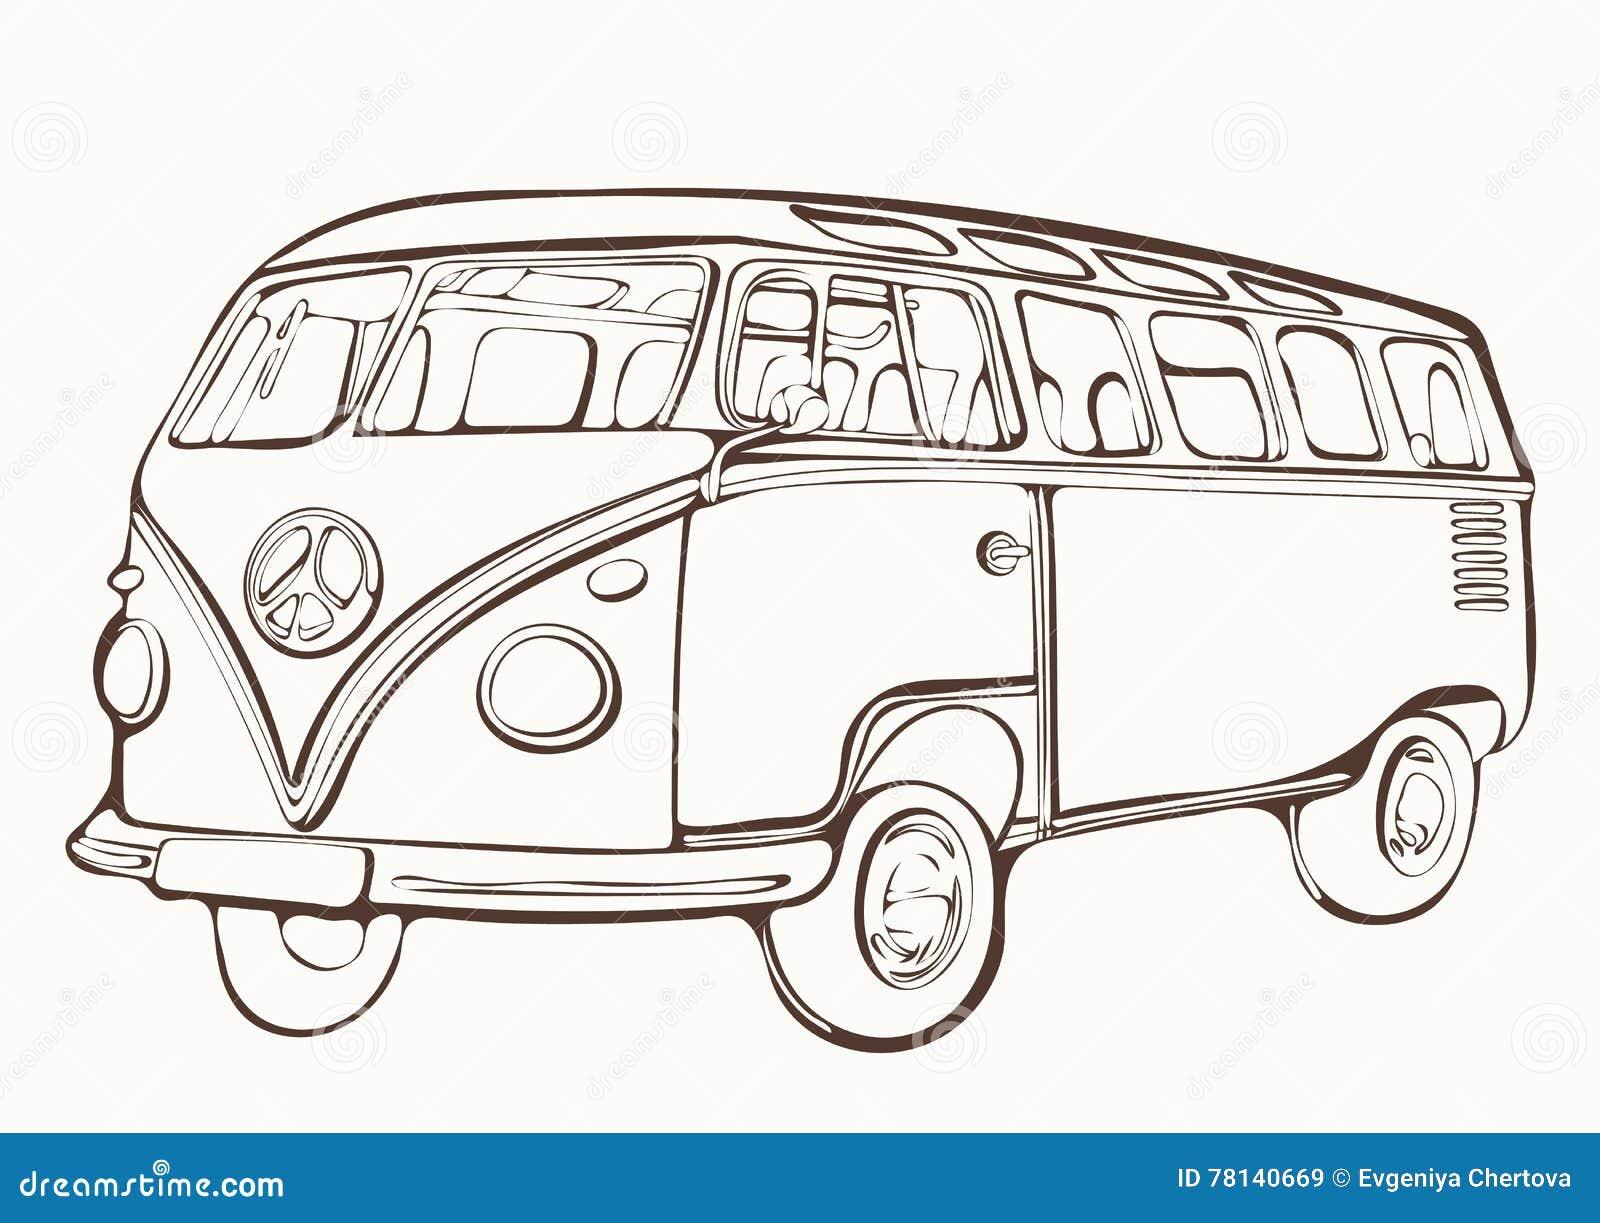 Onibus Do Vintage Carro Retro Livro Para Colorir Pintado Mao